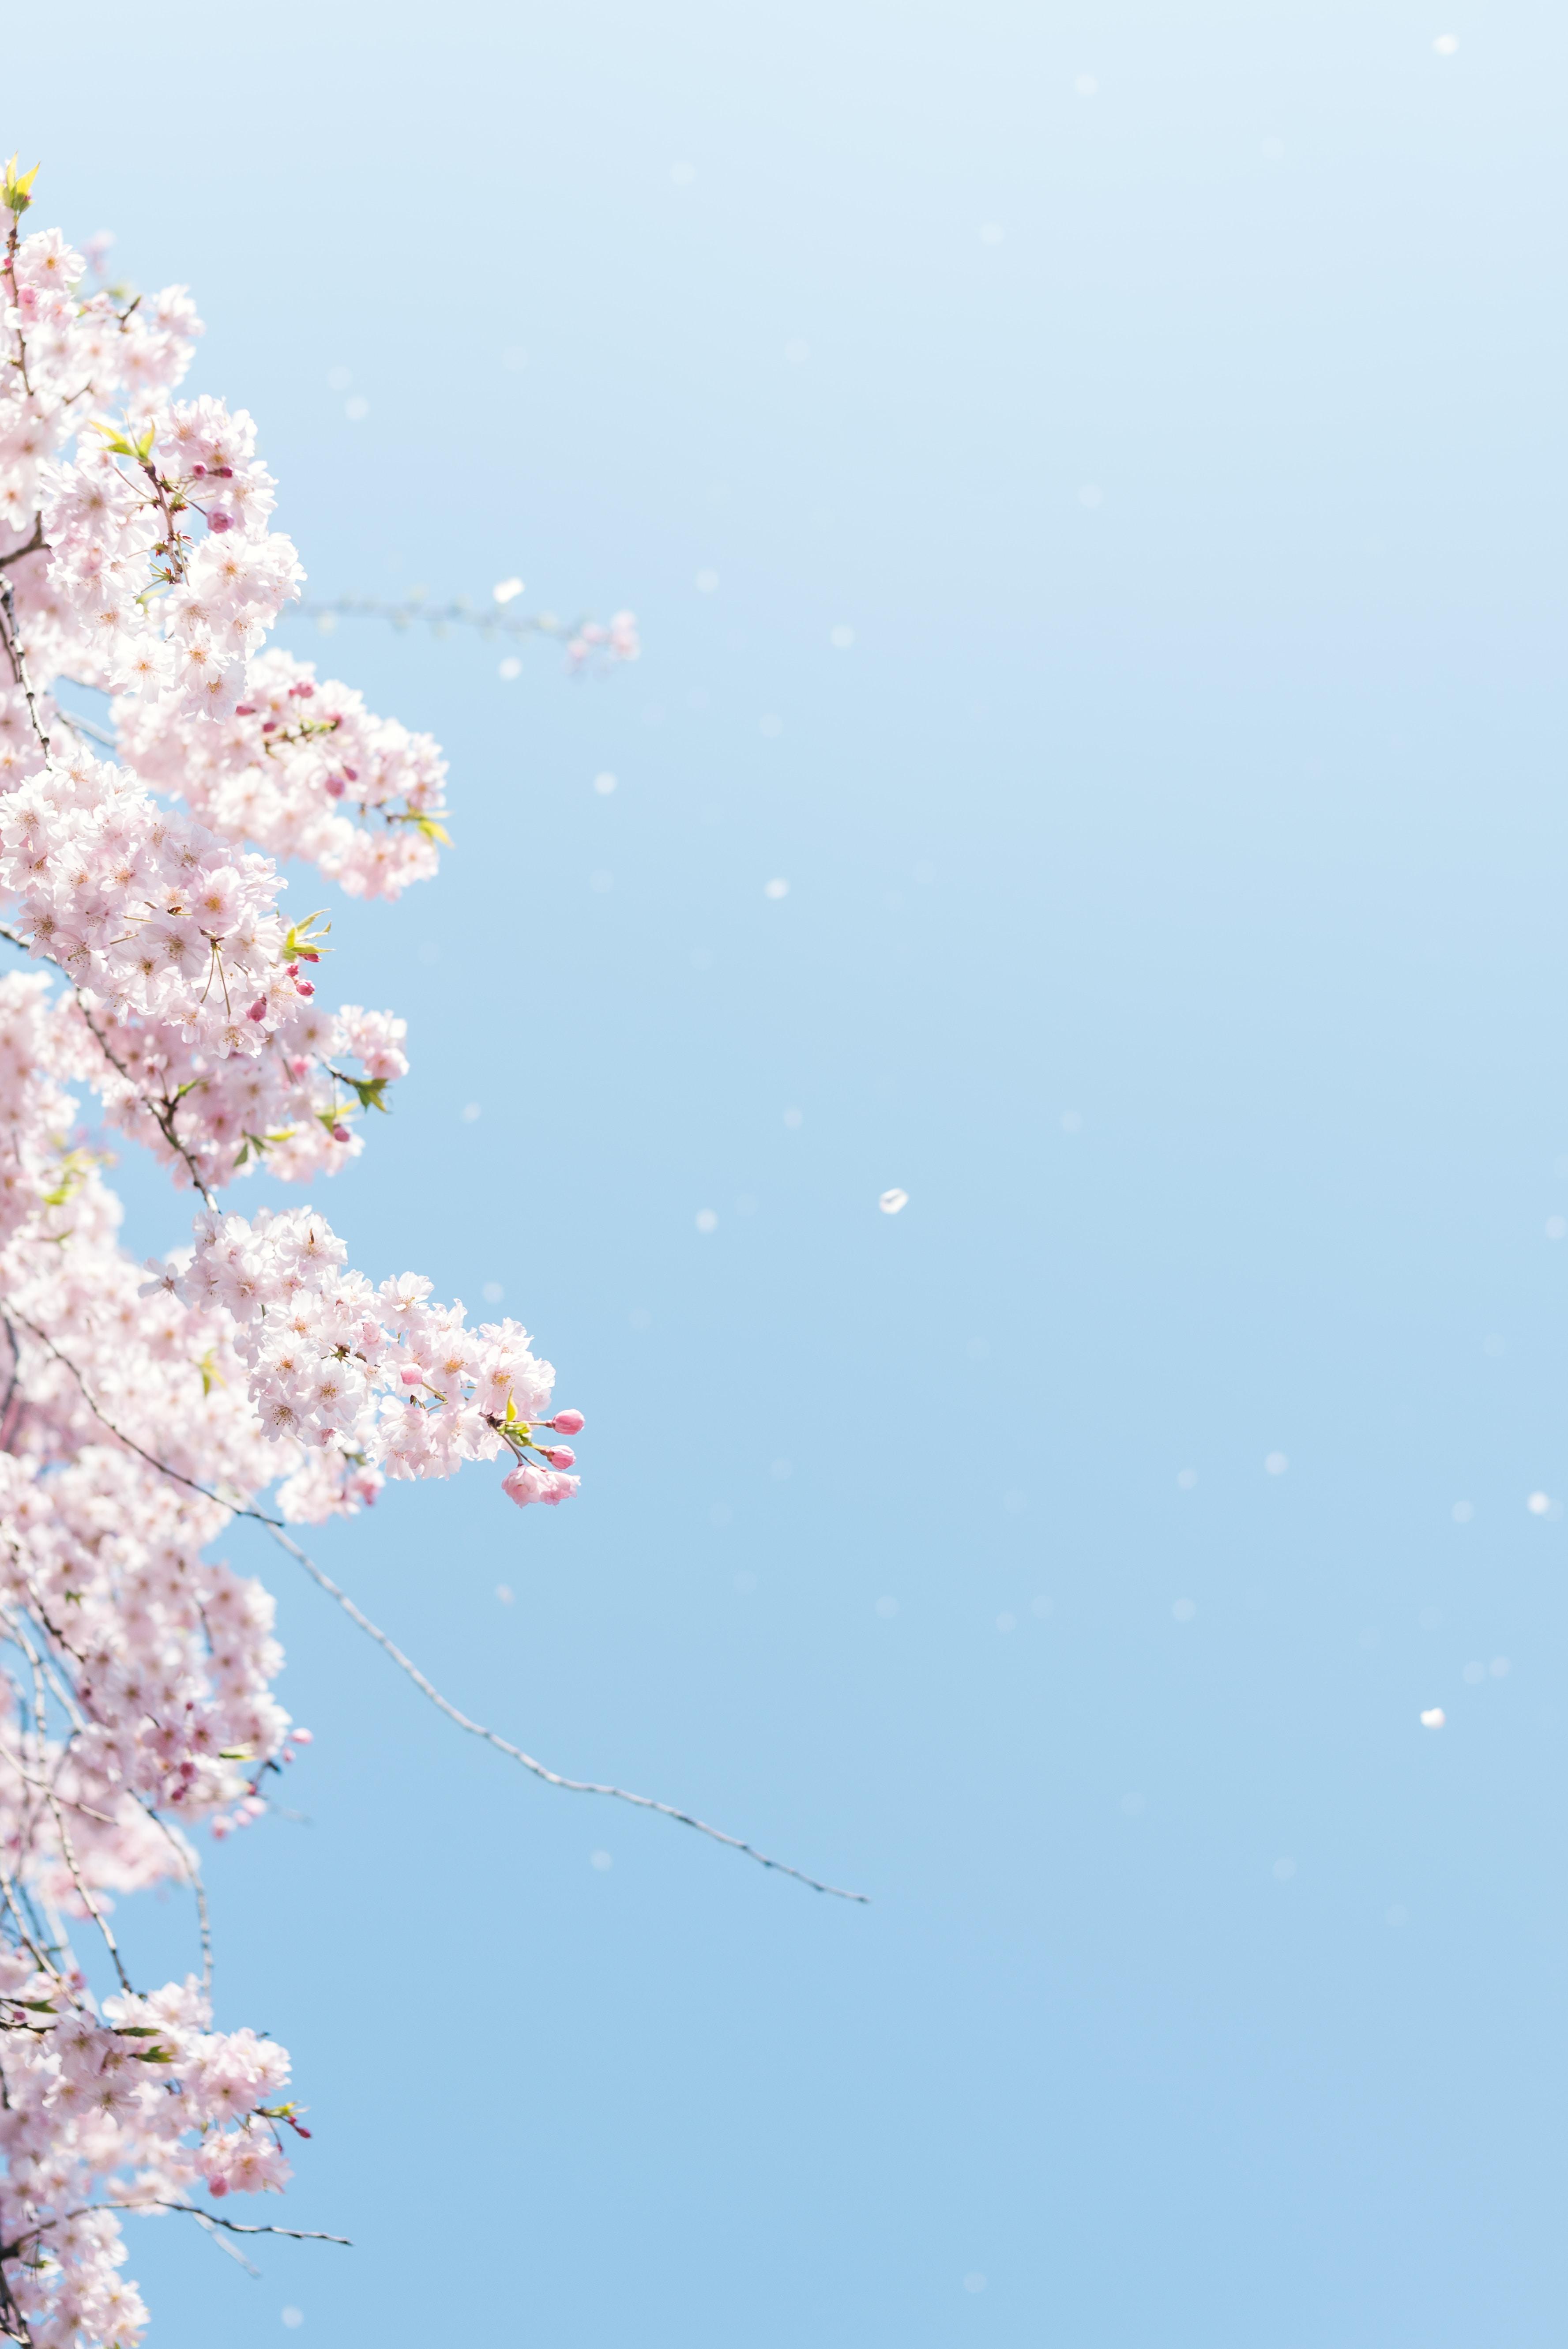 cherry blossom under blue sky